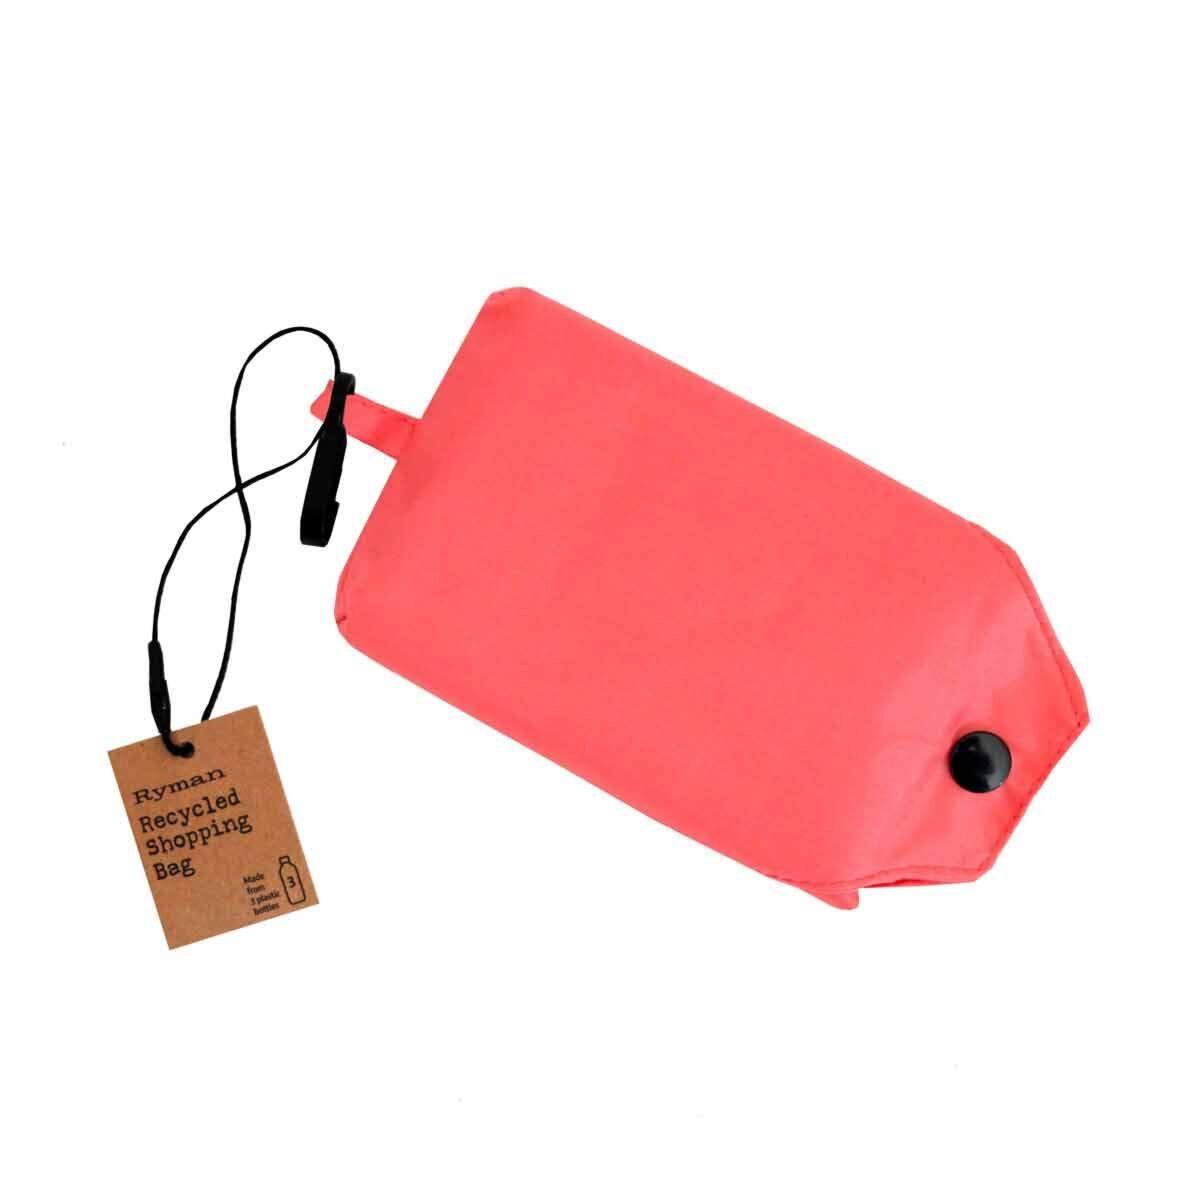 Ryman Reusable Foldaway Recycled Shopping Bag Coral